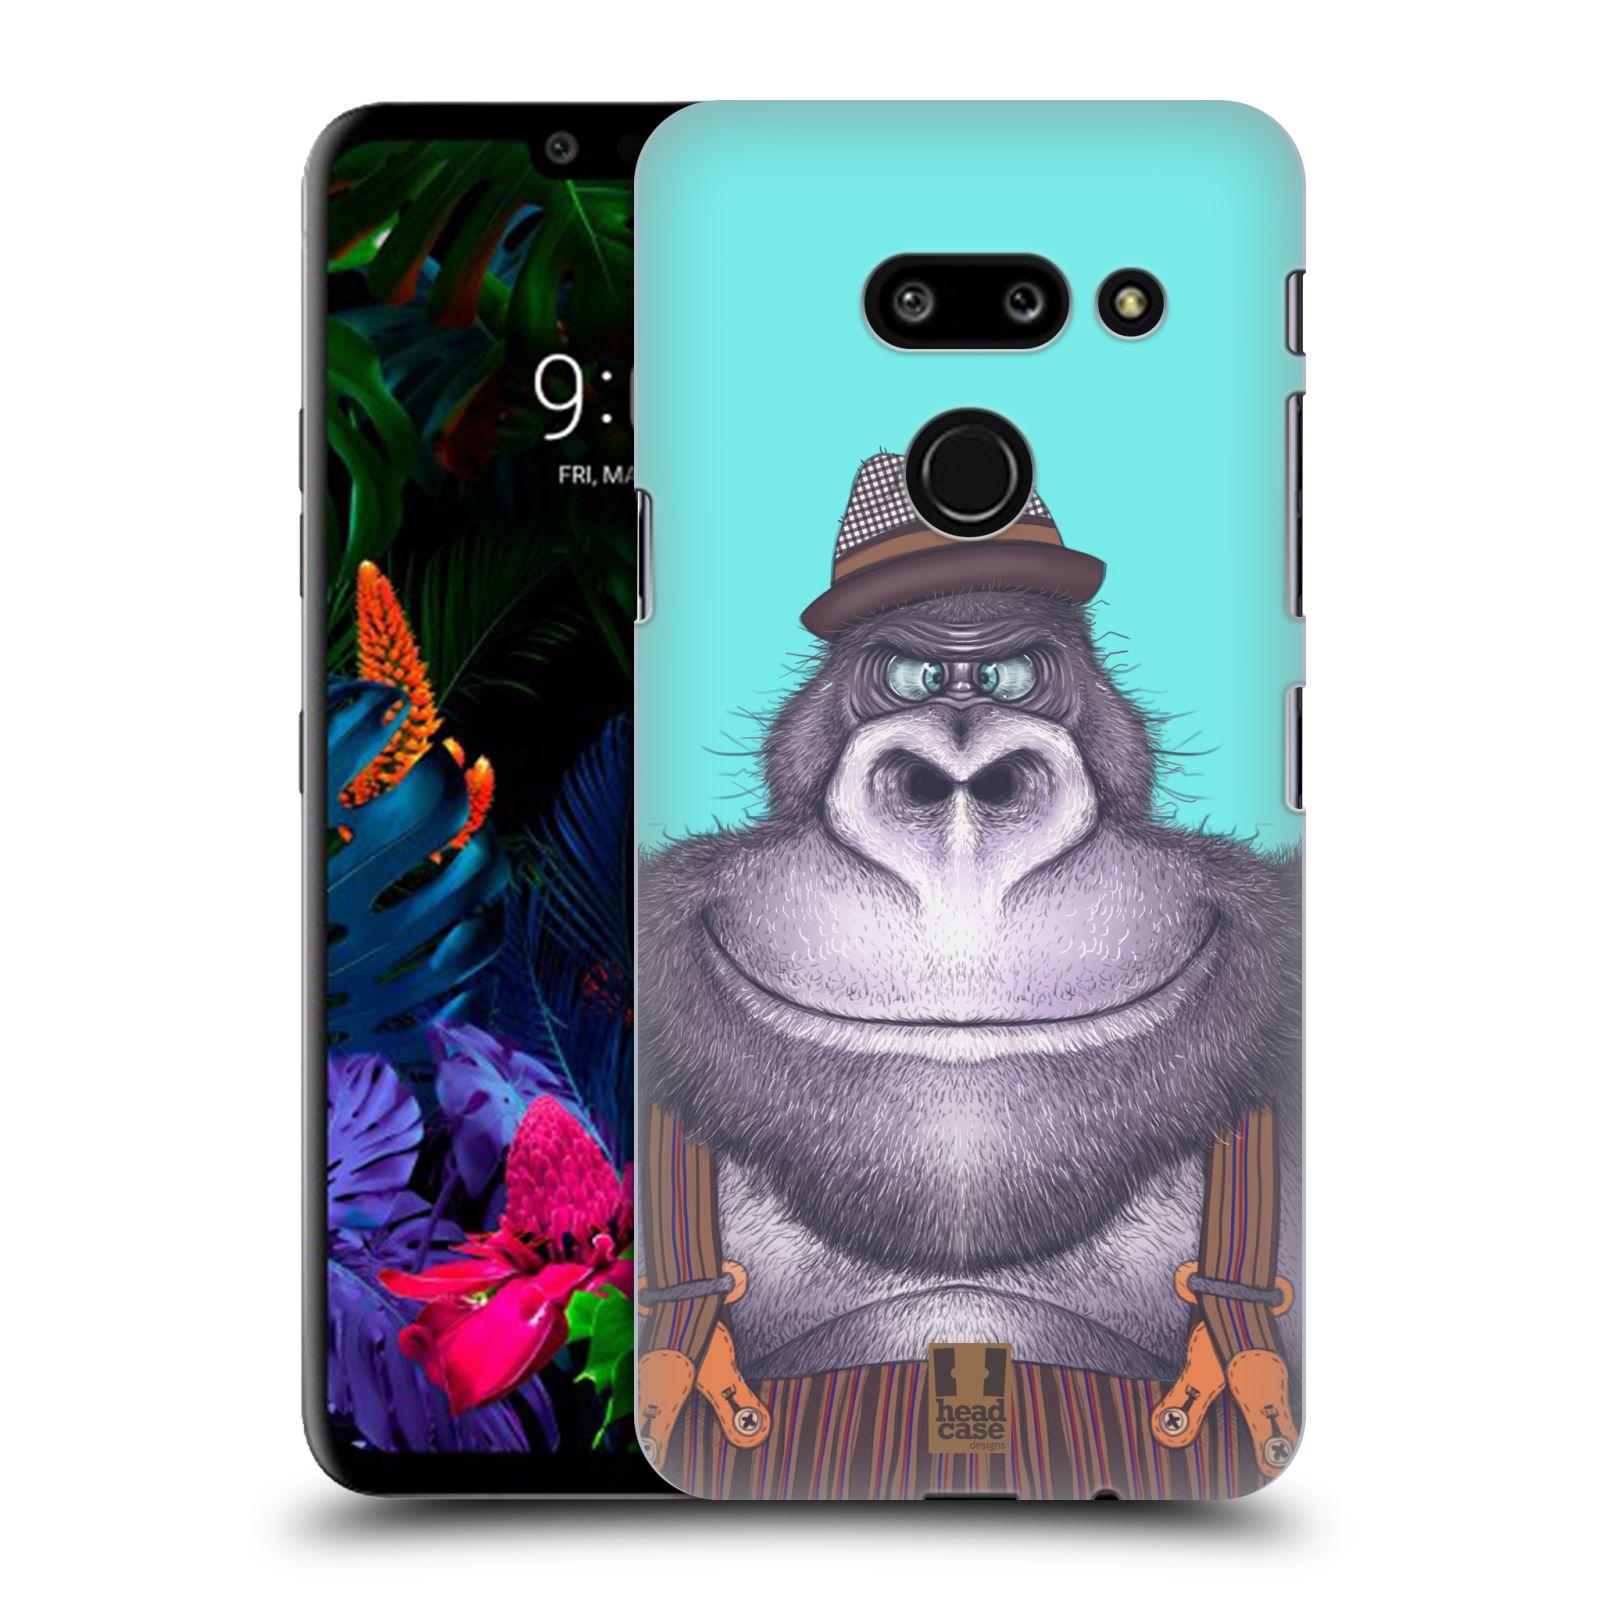 Plastové pouzdro na mobil LG G8 ThinQ - Head Case - ANIMPLA GORILÁK